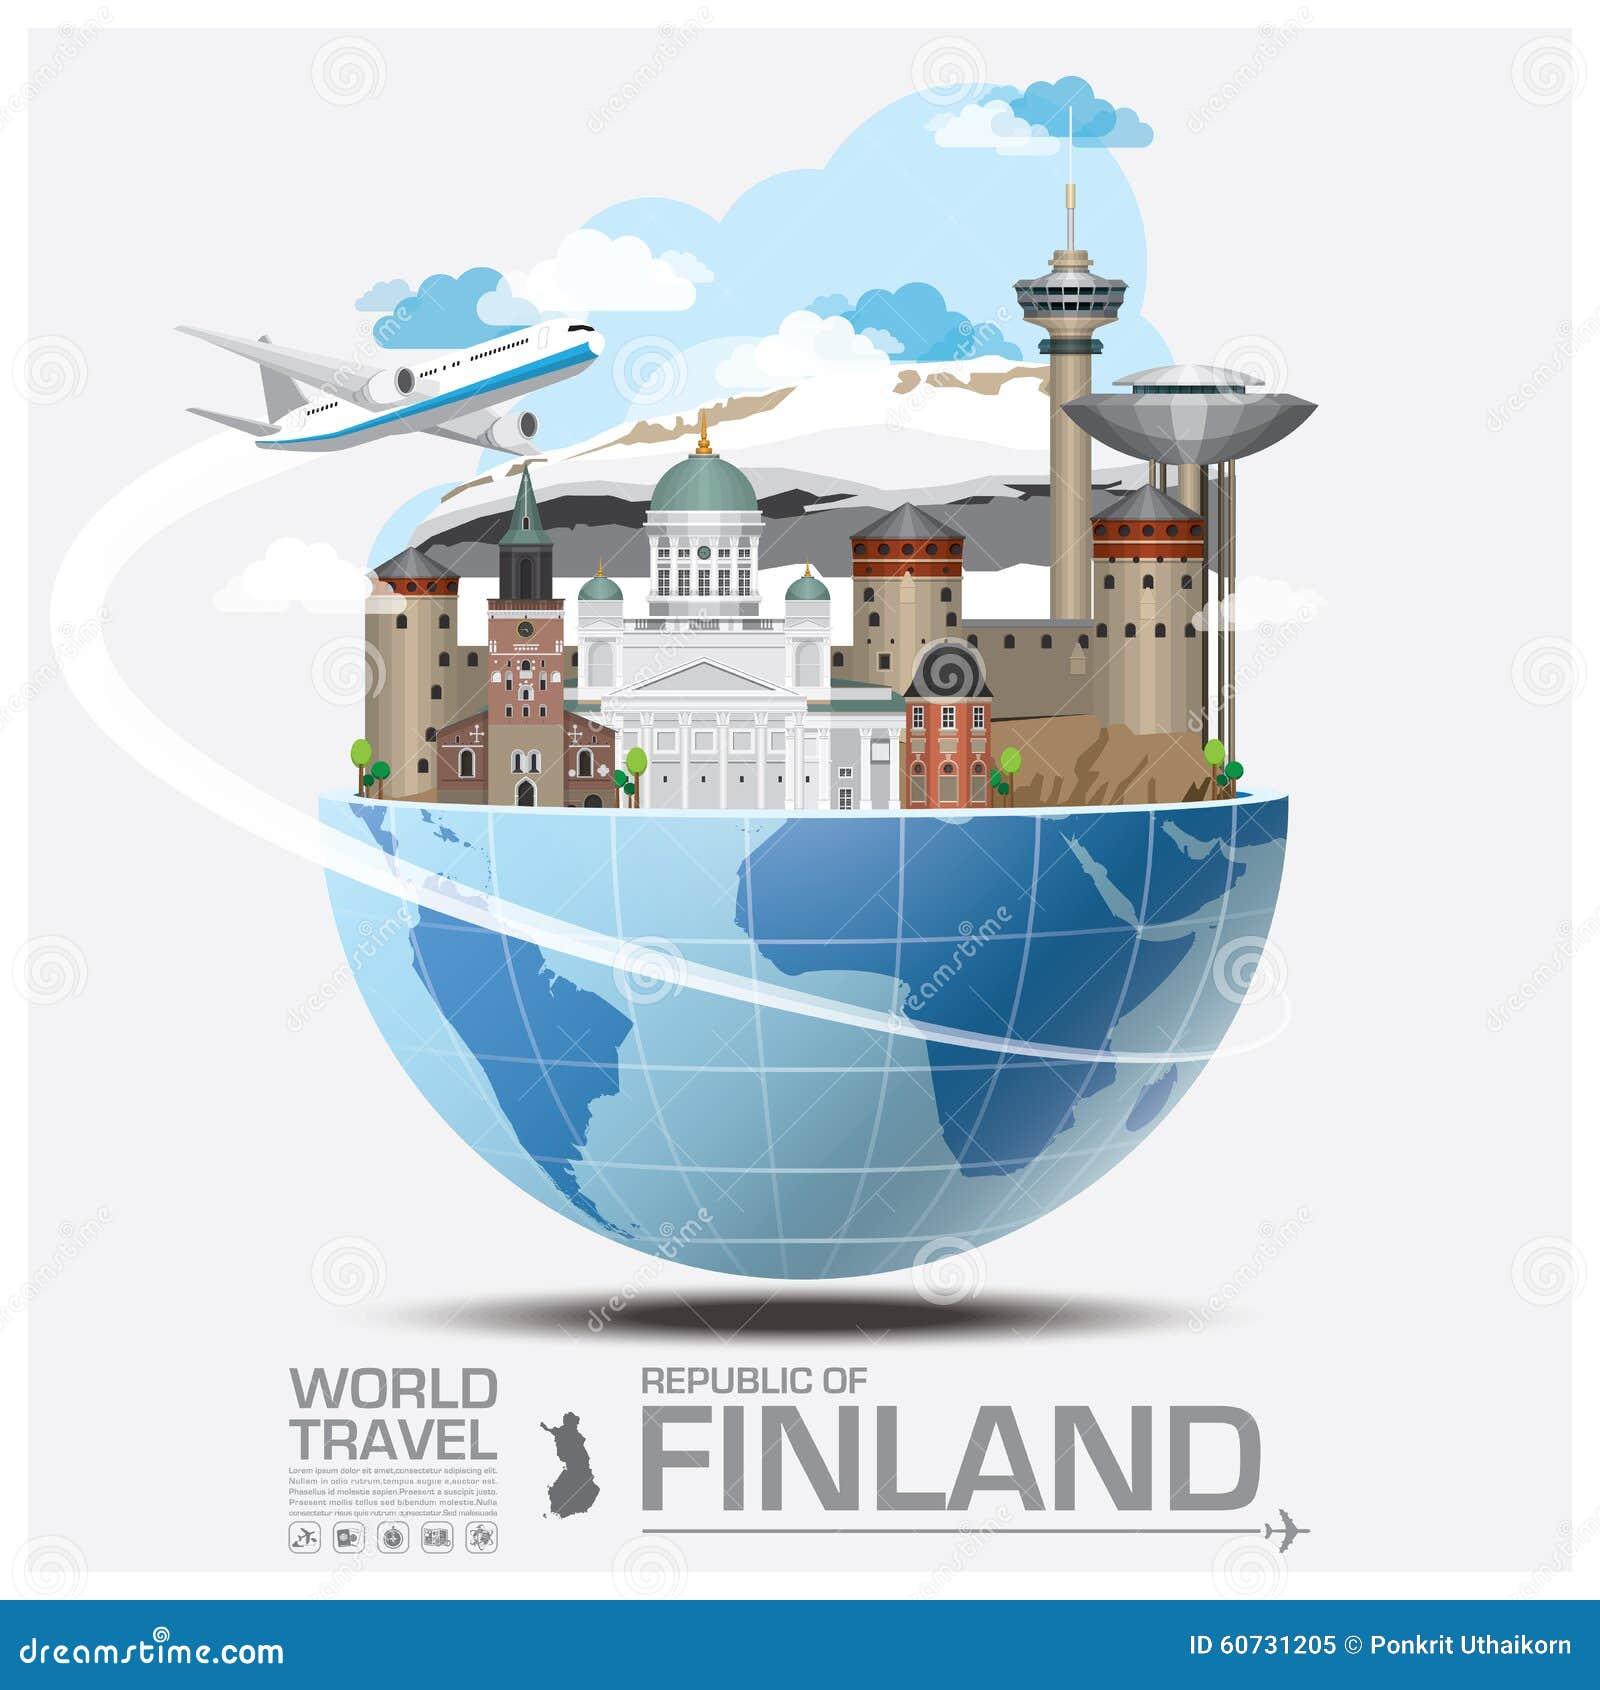 finland landmark global travel and journey infographic